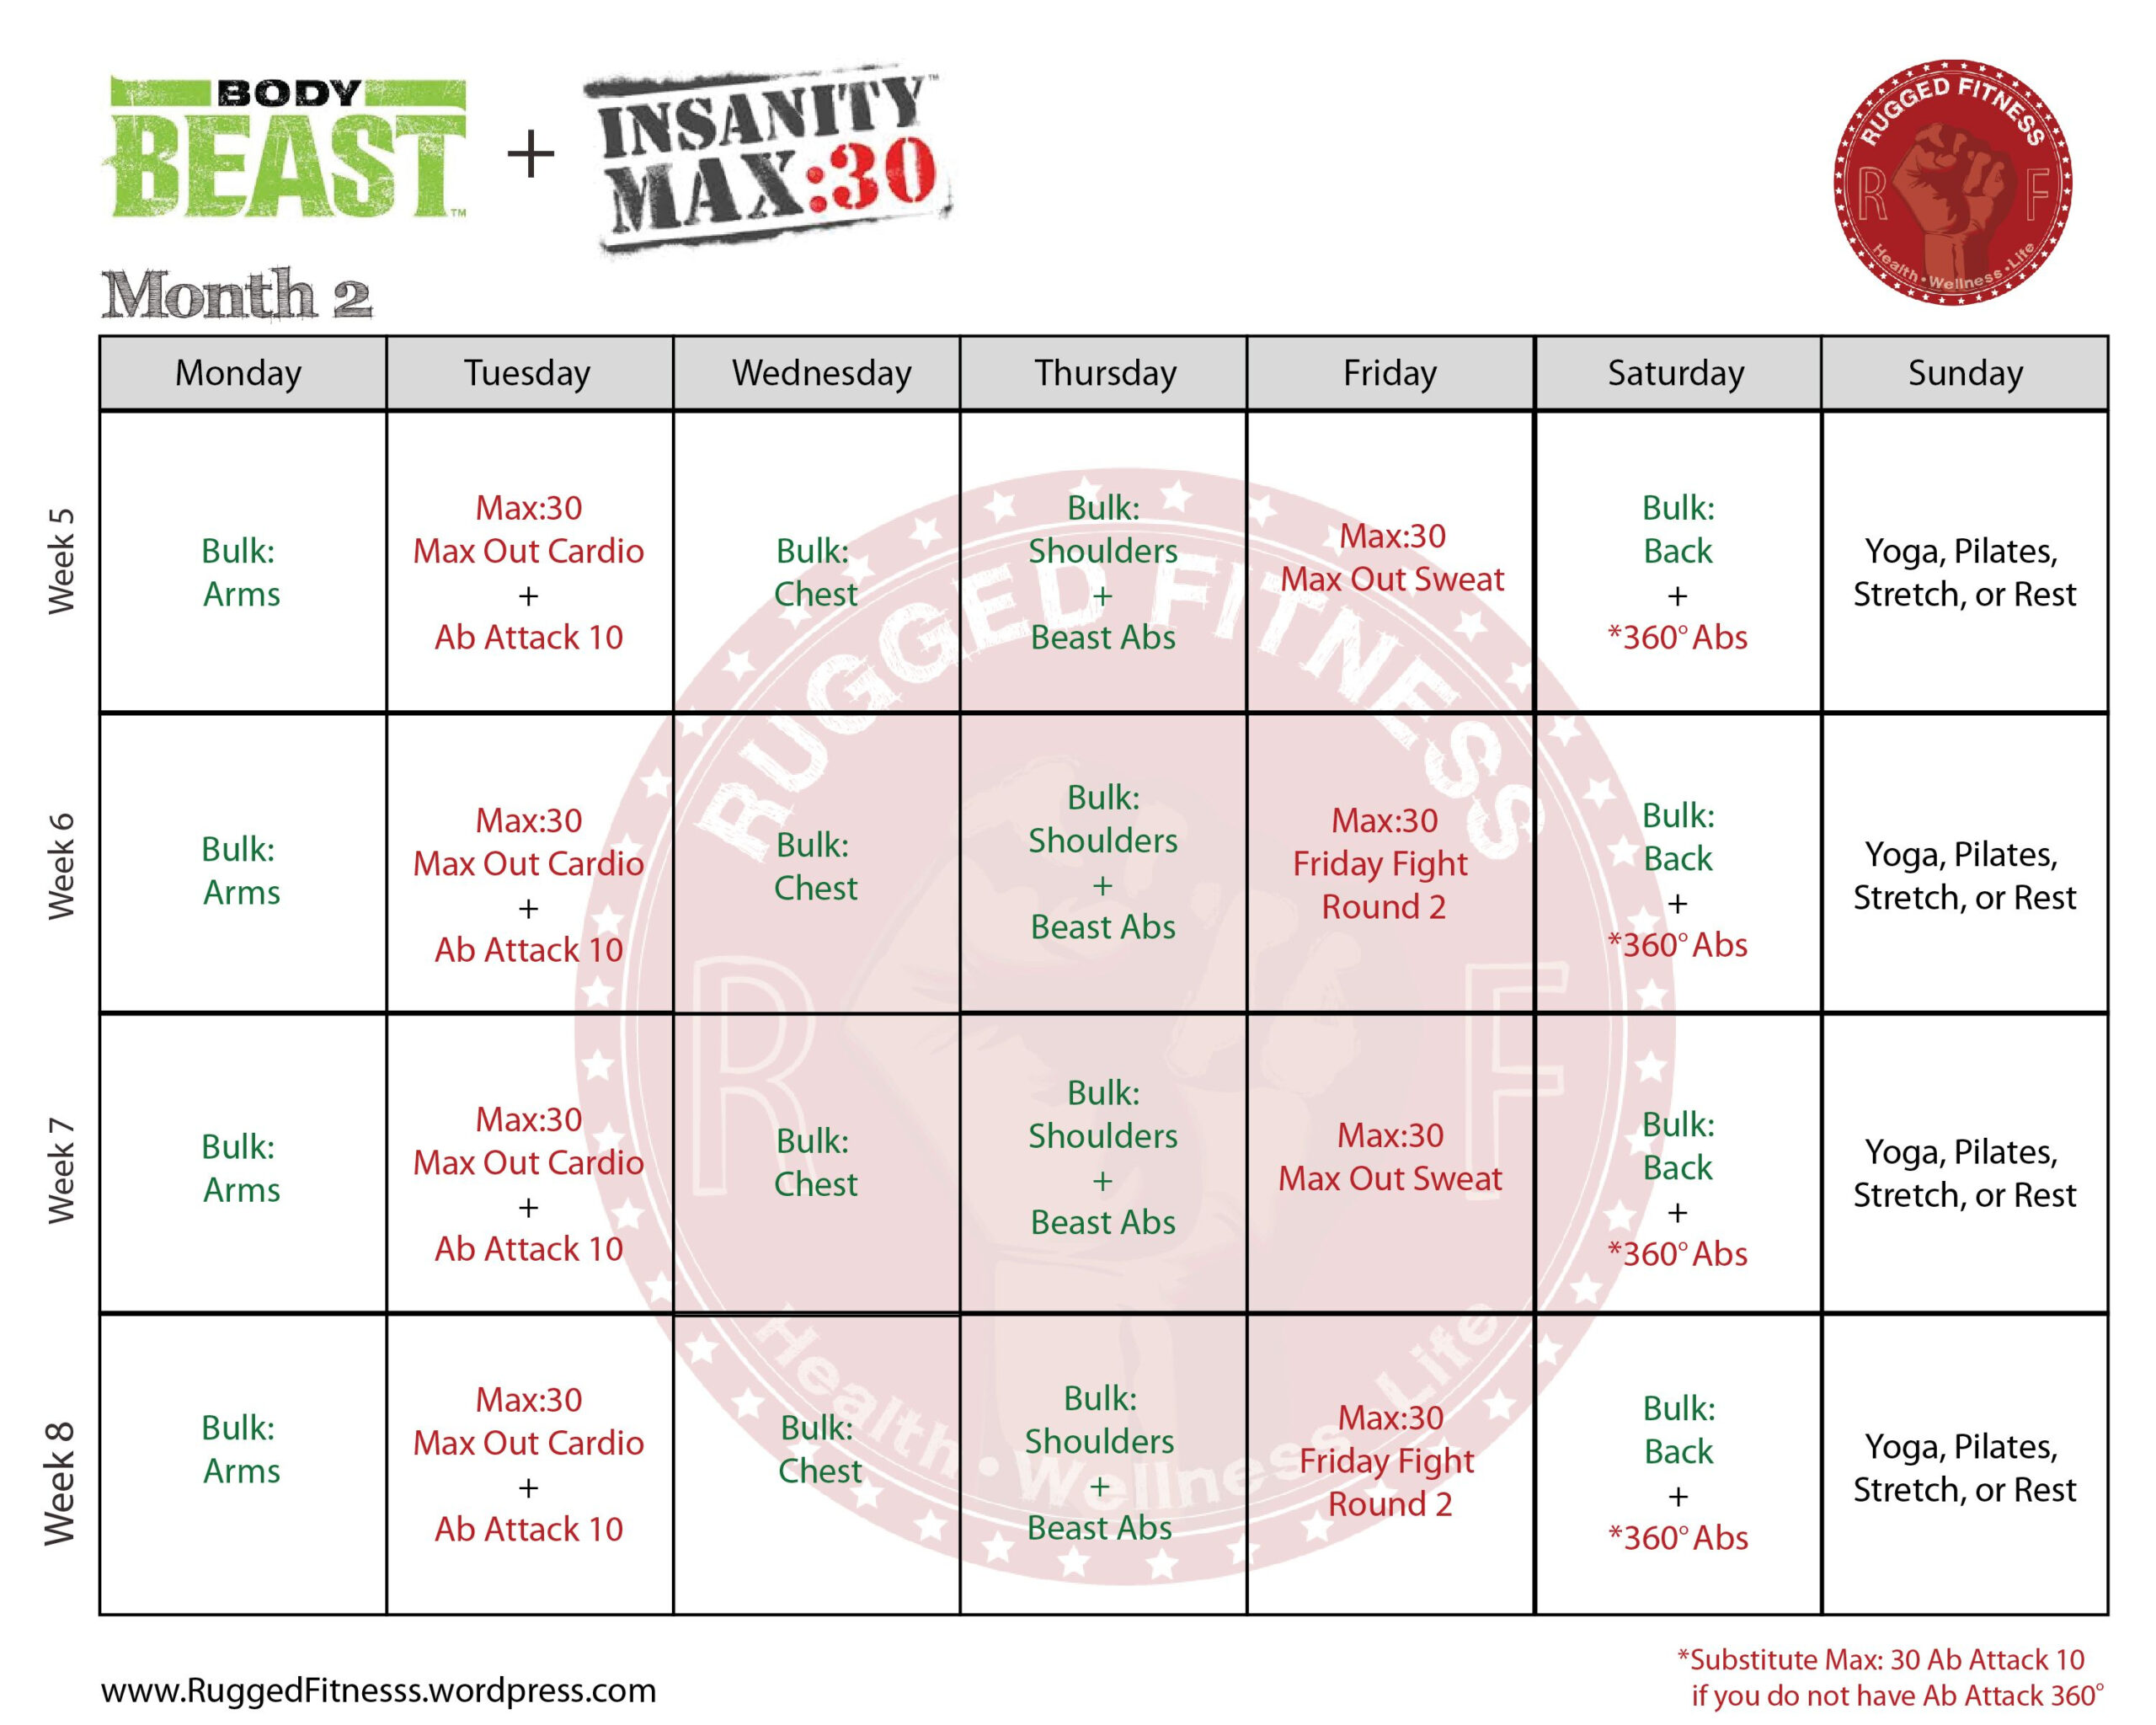 Insanity Max 30 Body Beast Hybrid | Calendar For Planning with Insanity Max 30 Hybrid Calendar